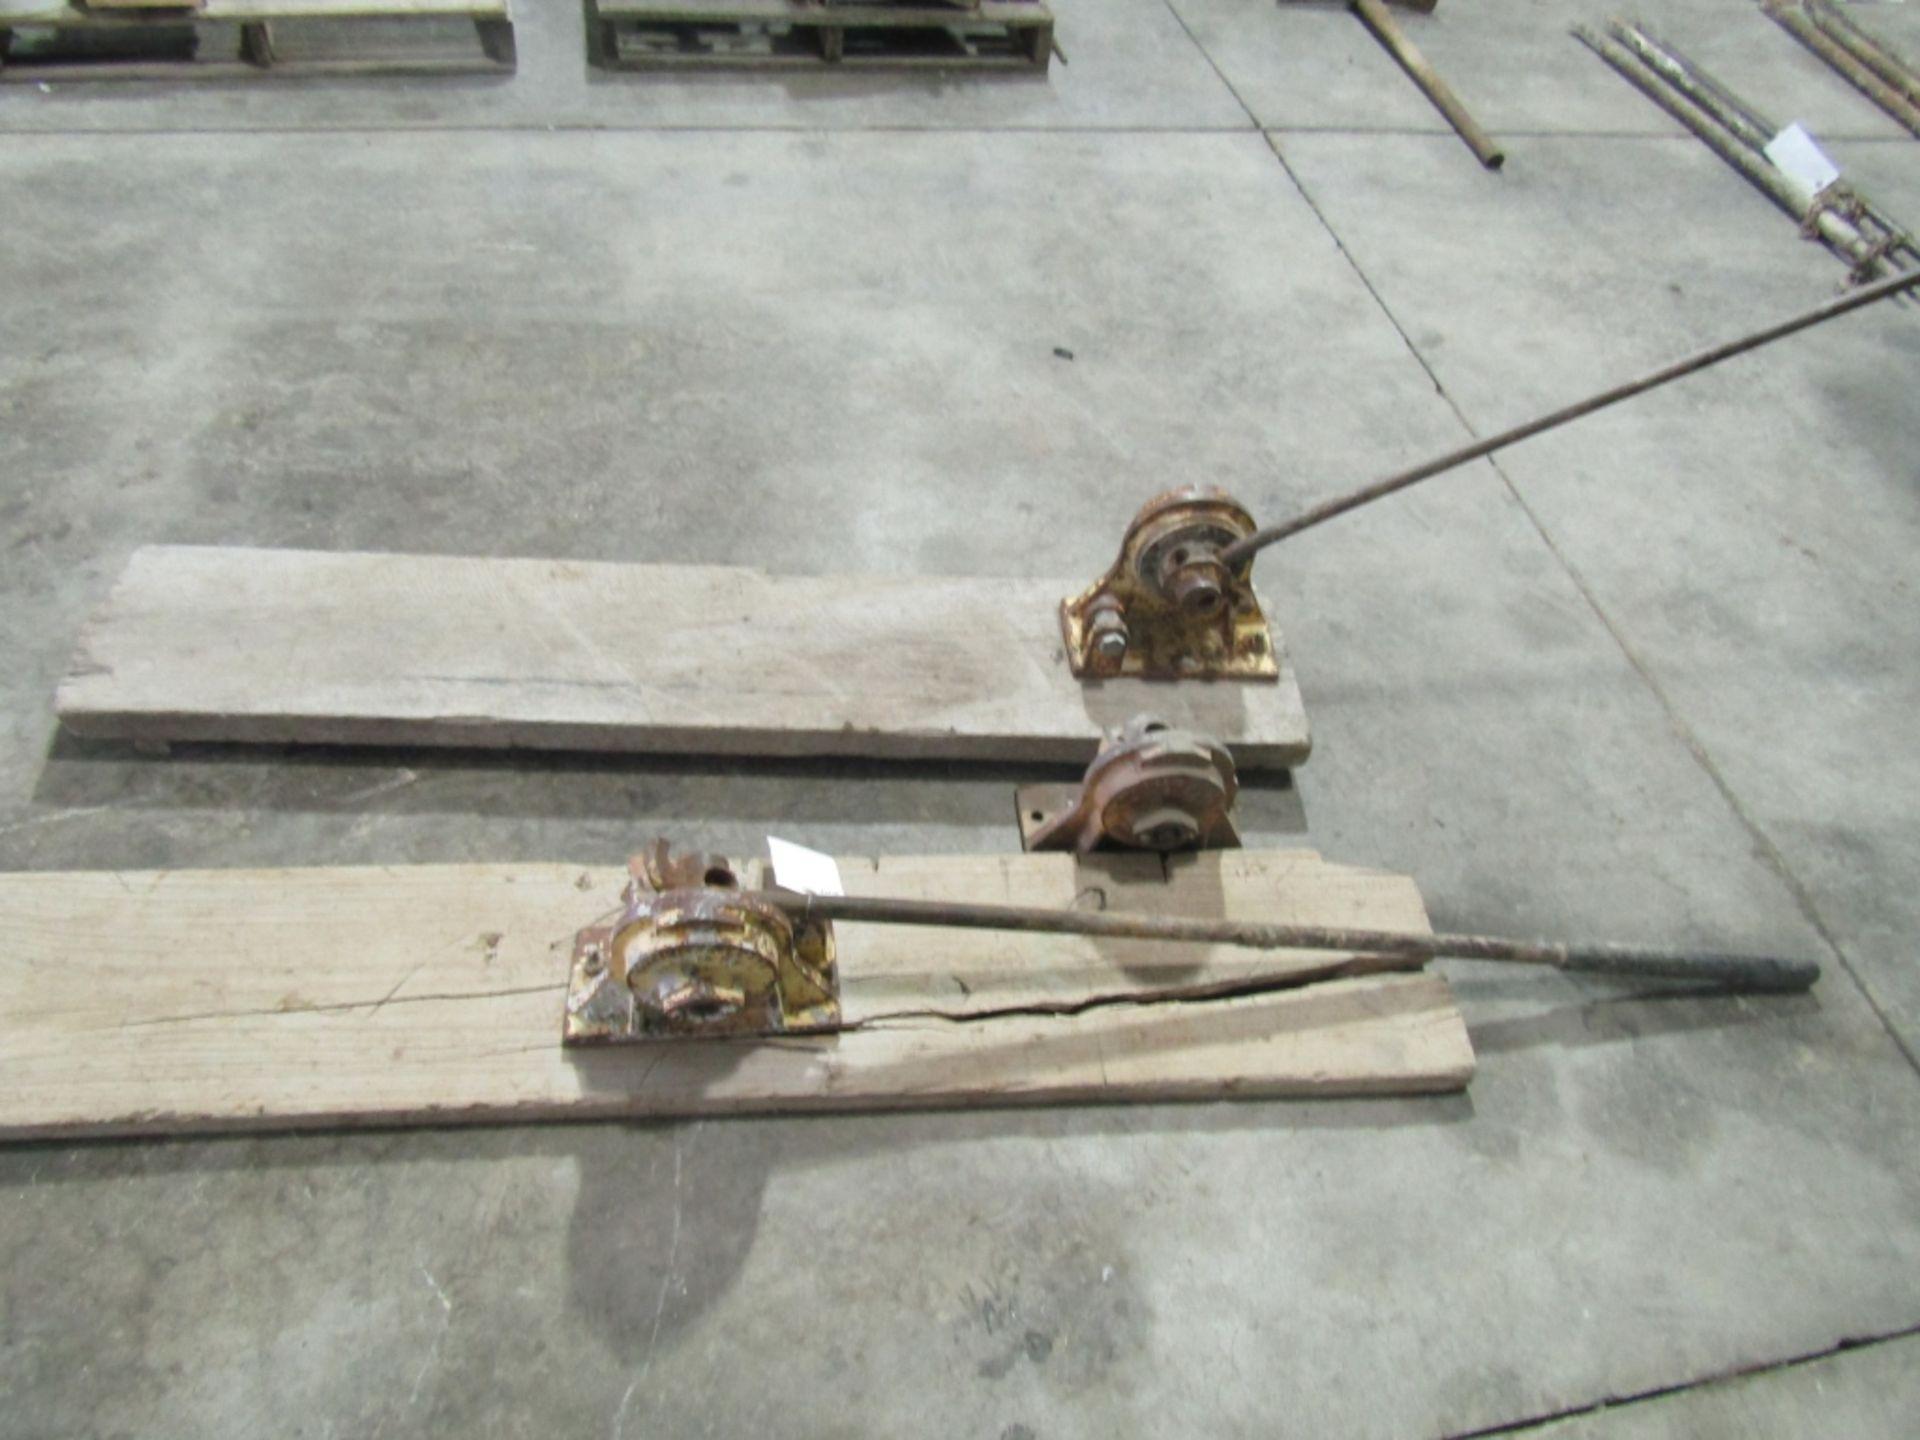 Lot 234 - (2) Rebar Benders, Located in Winterset, IA